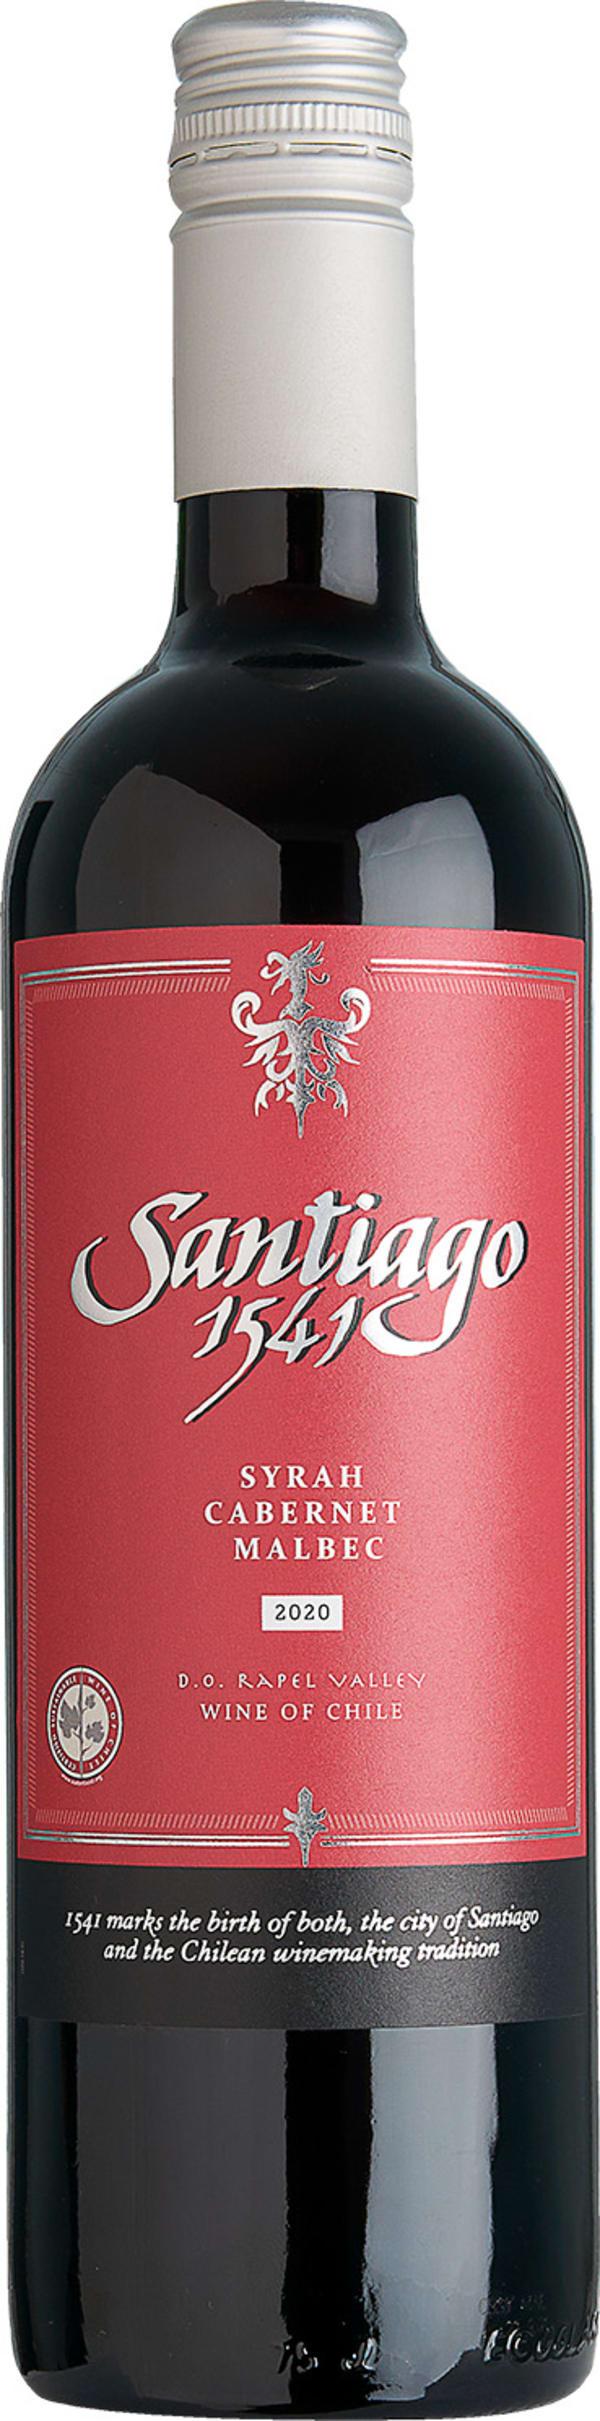 Santiago 1541 Syrah Cabernet Malbec 2016